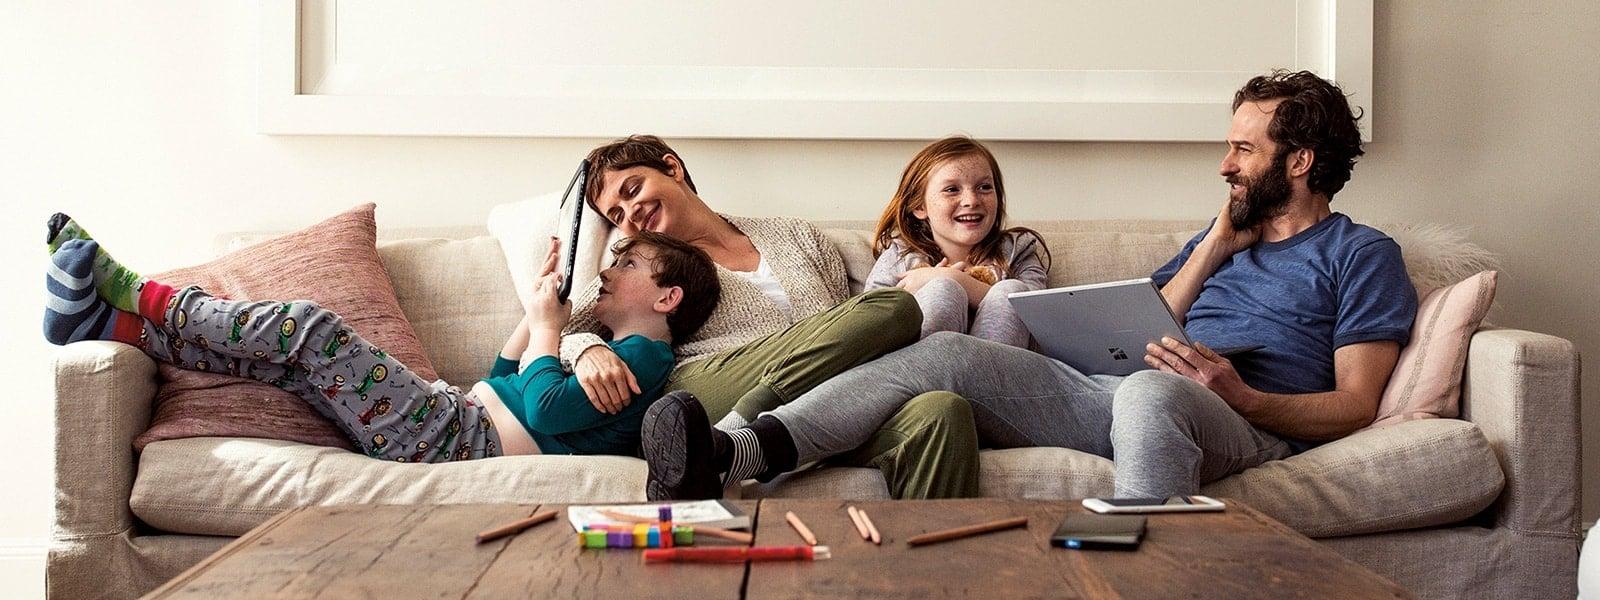 Семья отдыхает на диване